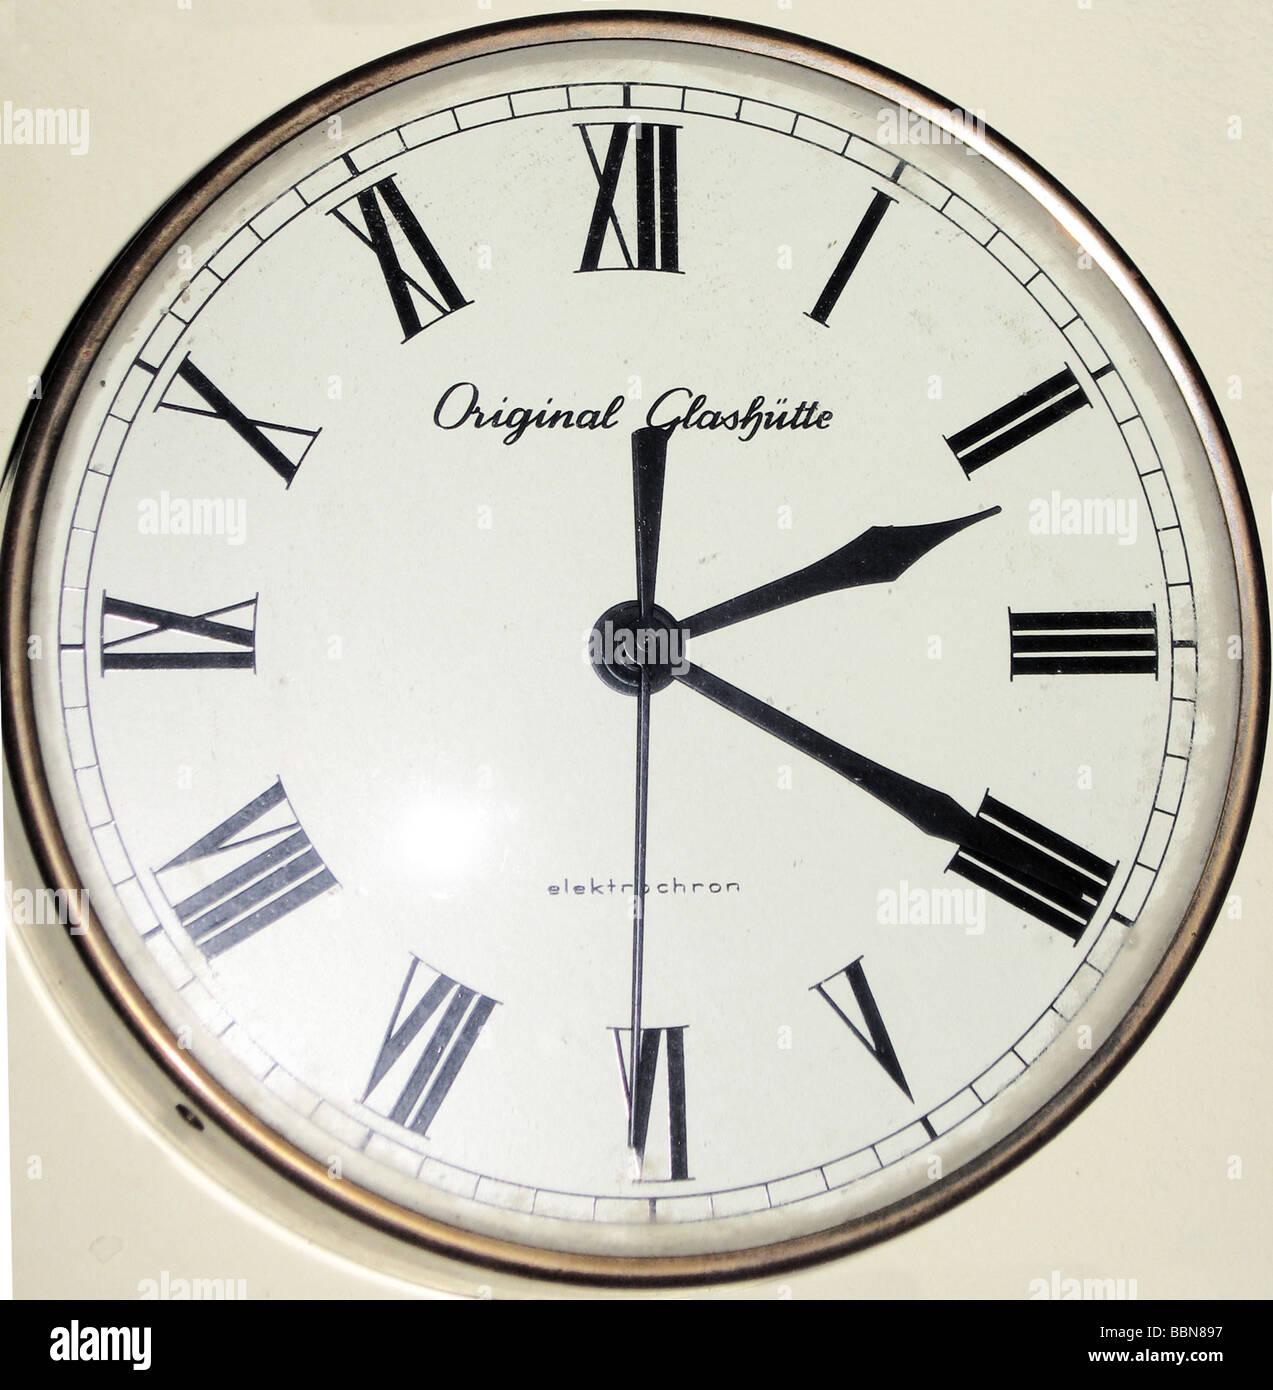 Clocks electric wall clock glashtte elektrochron made by veb clocks electric wall clock glashtte elektrochron made by veb uhrenwerk glashtte gdr 1968 historic historical 20th centu amipublicfo Gallery